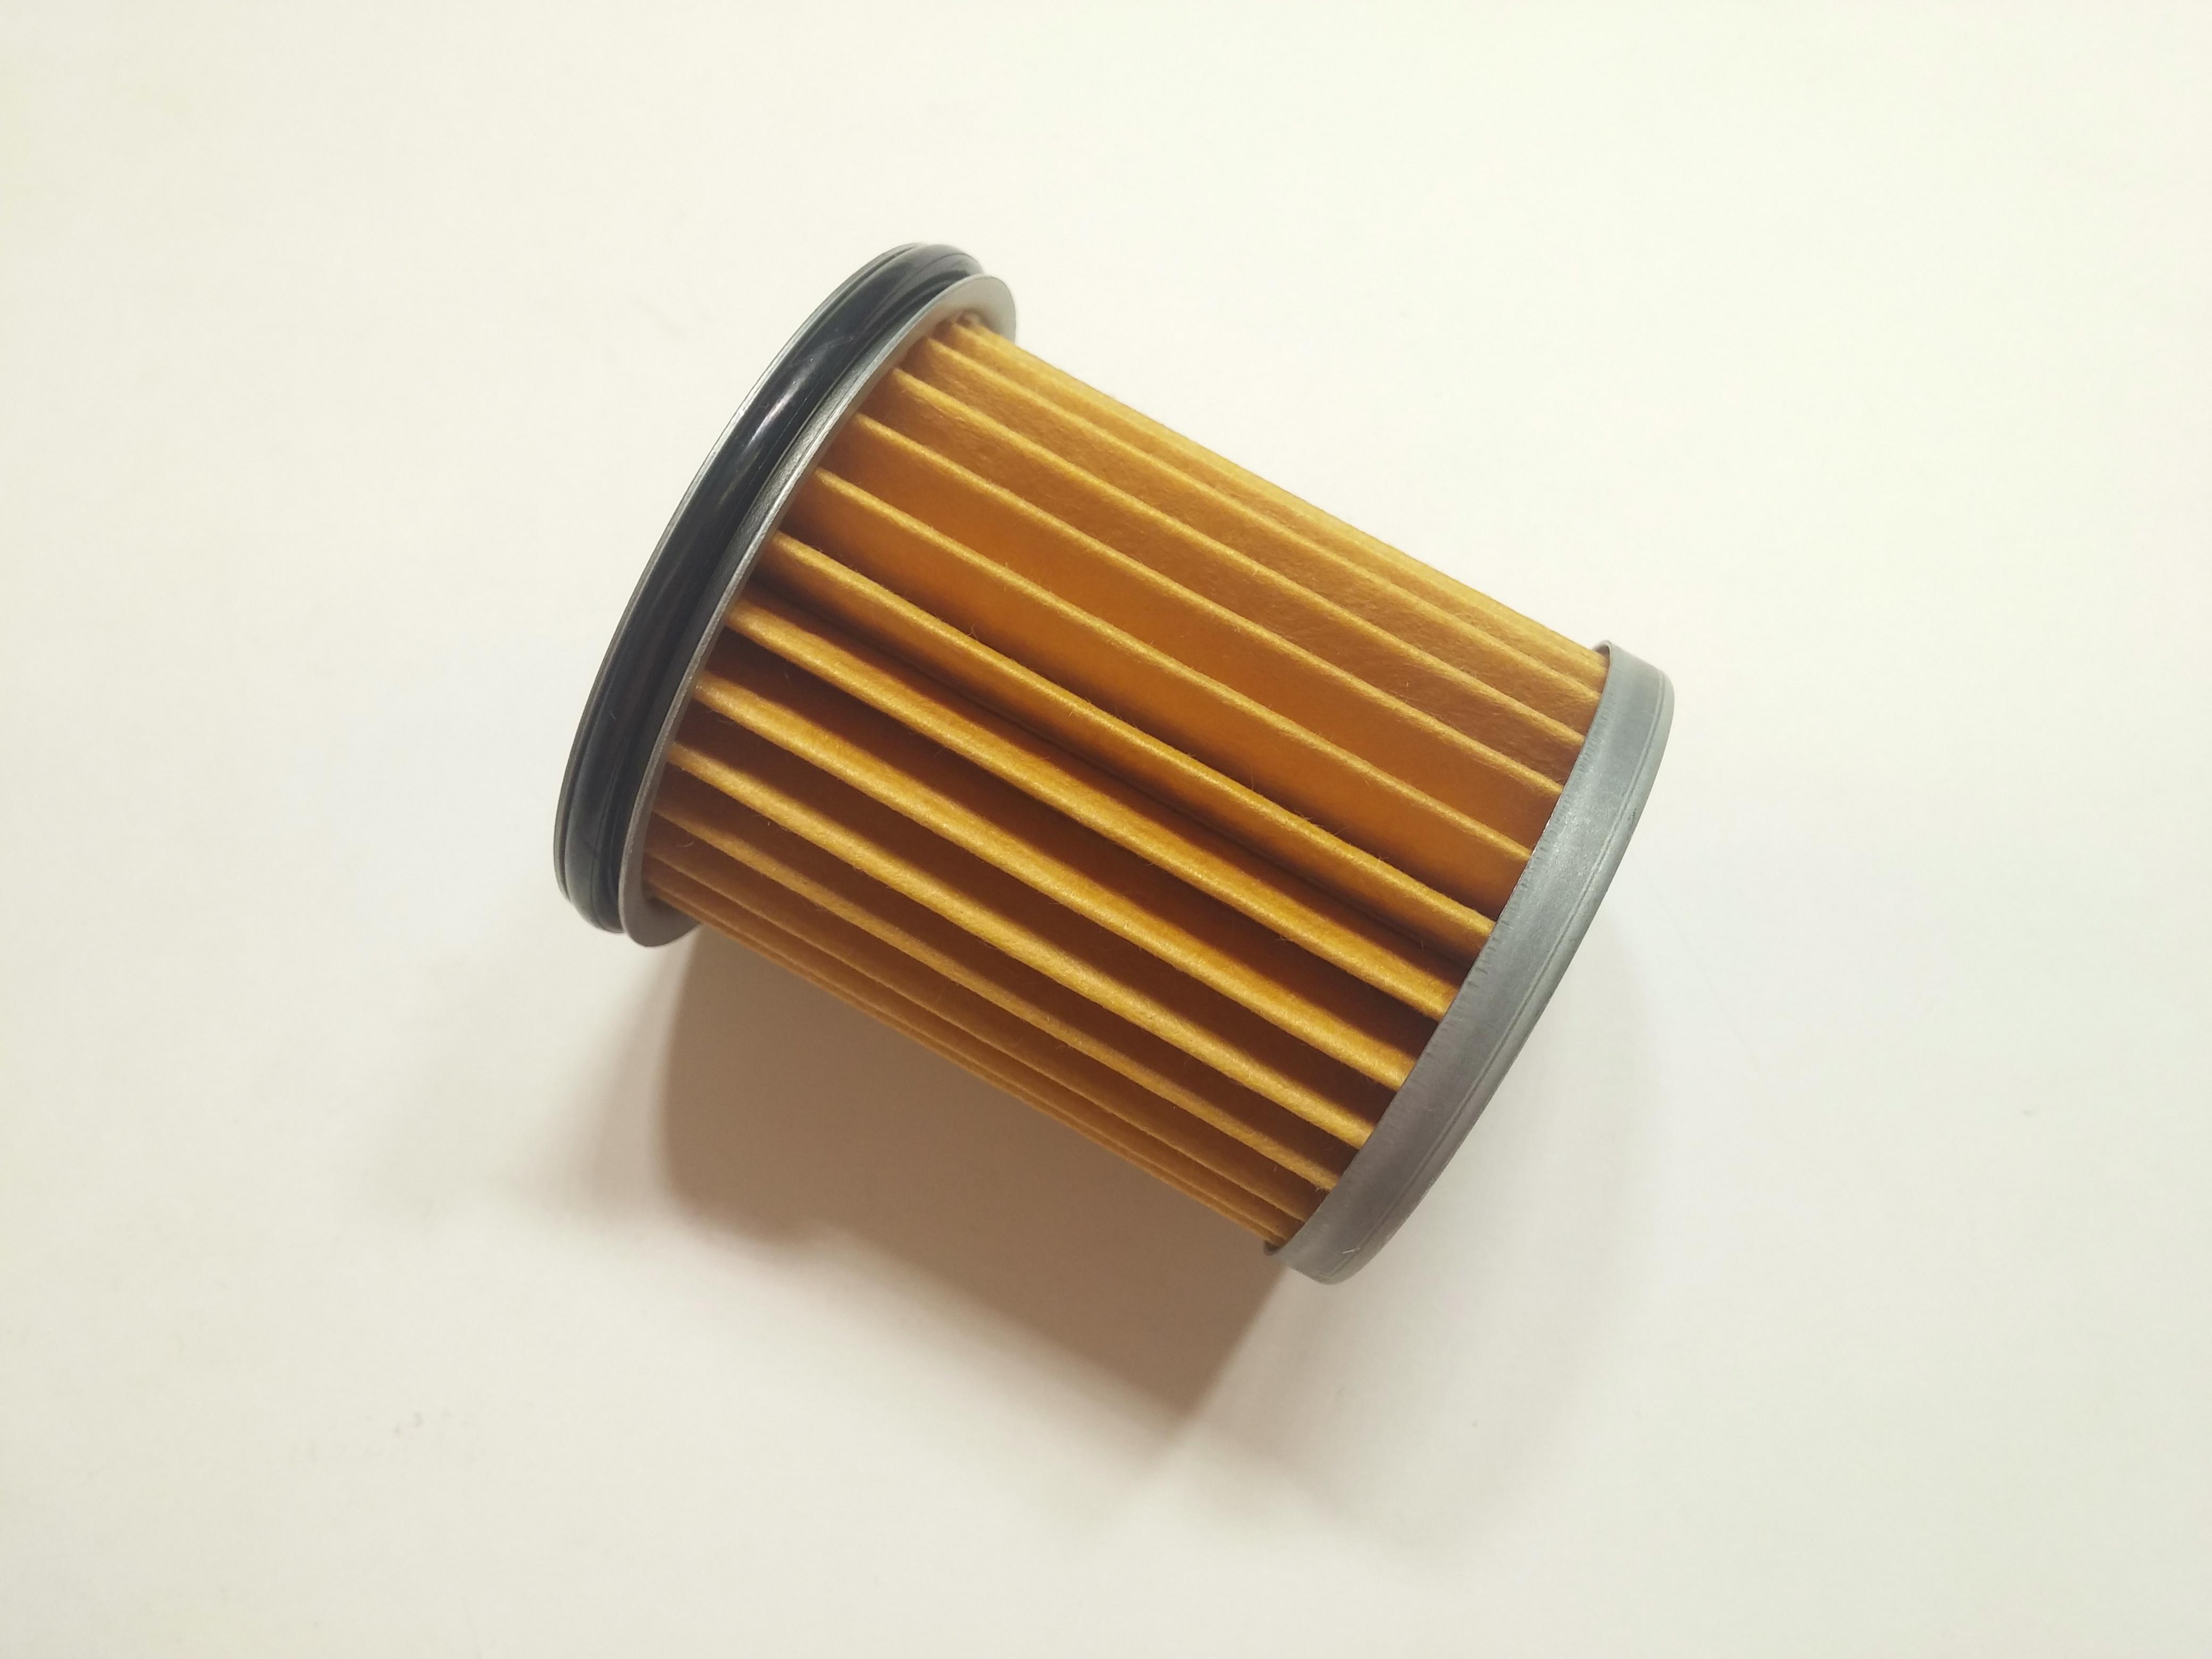 2017 subaru forester filter assembly auto transmission. Black Bedroom Furniture Sets. Home Design Ideas